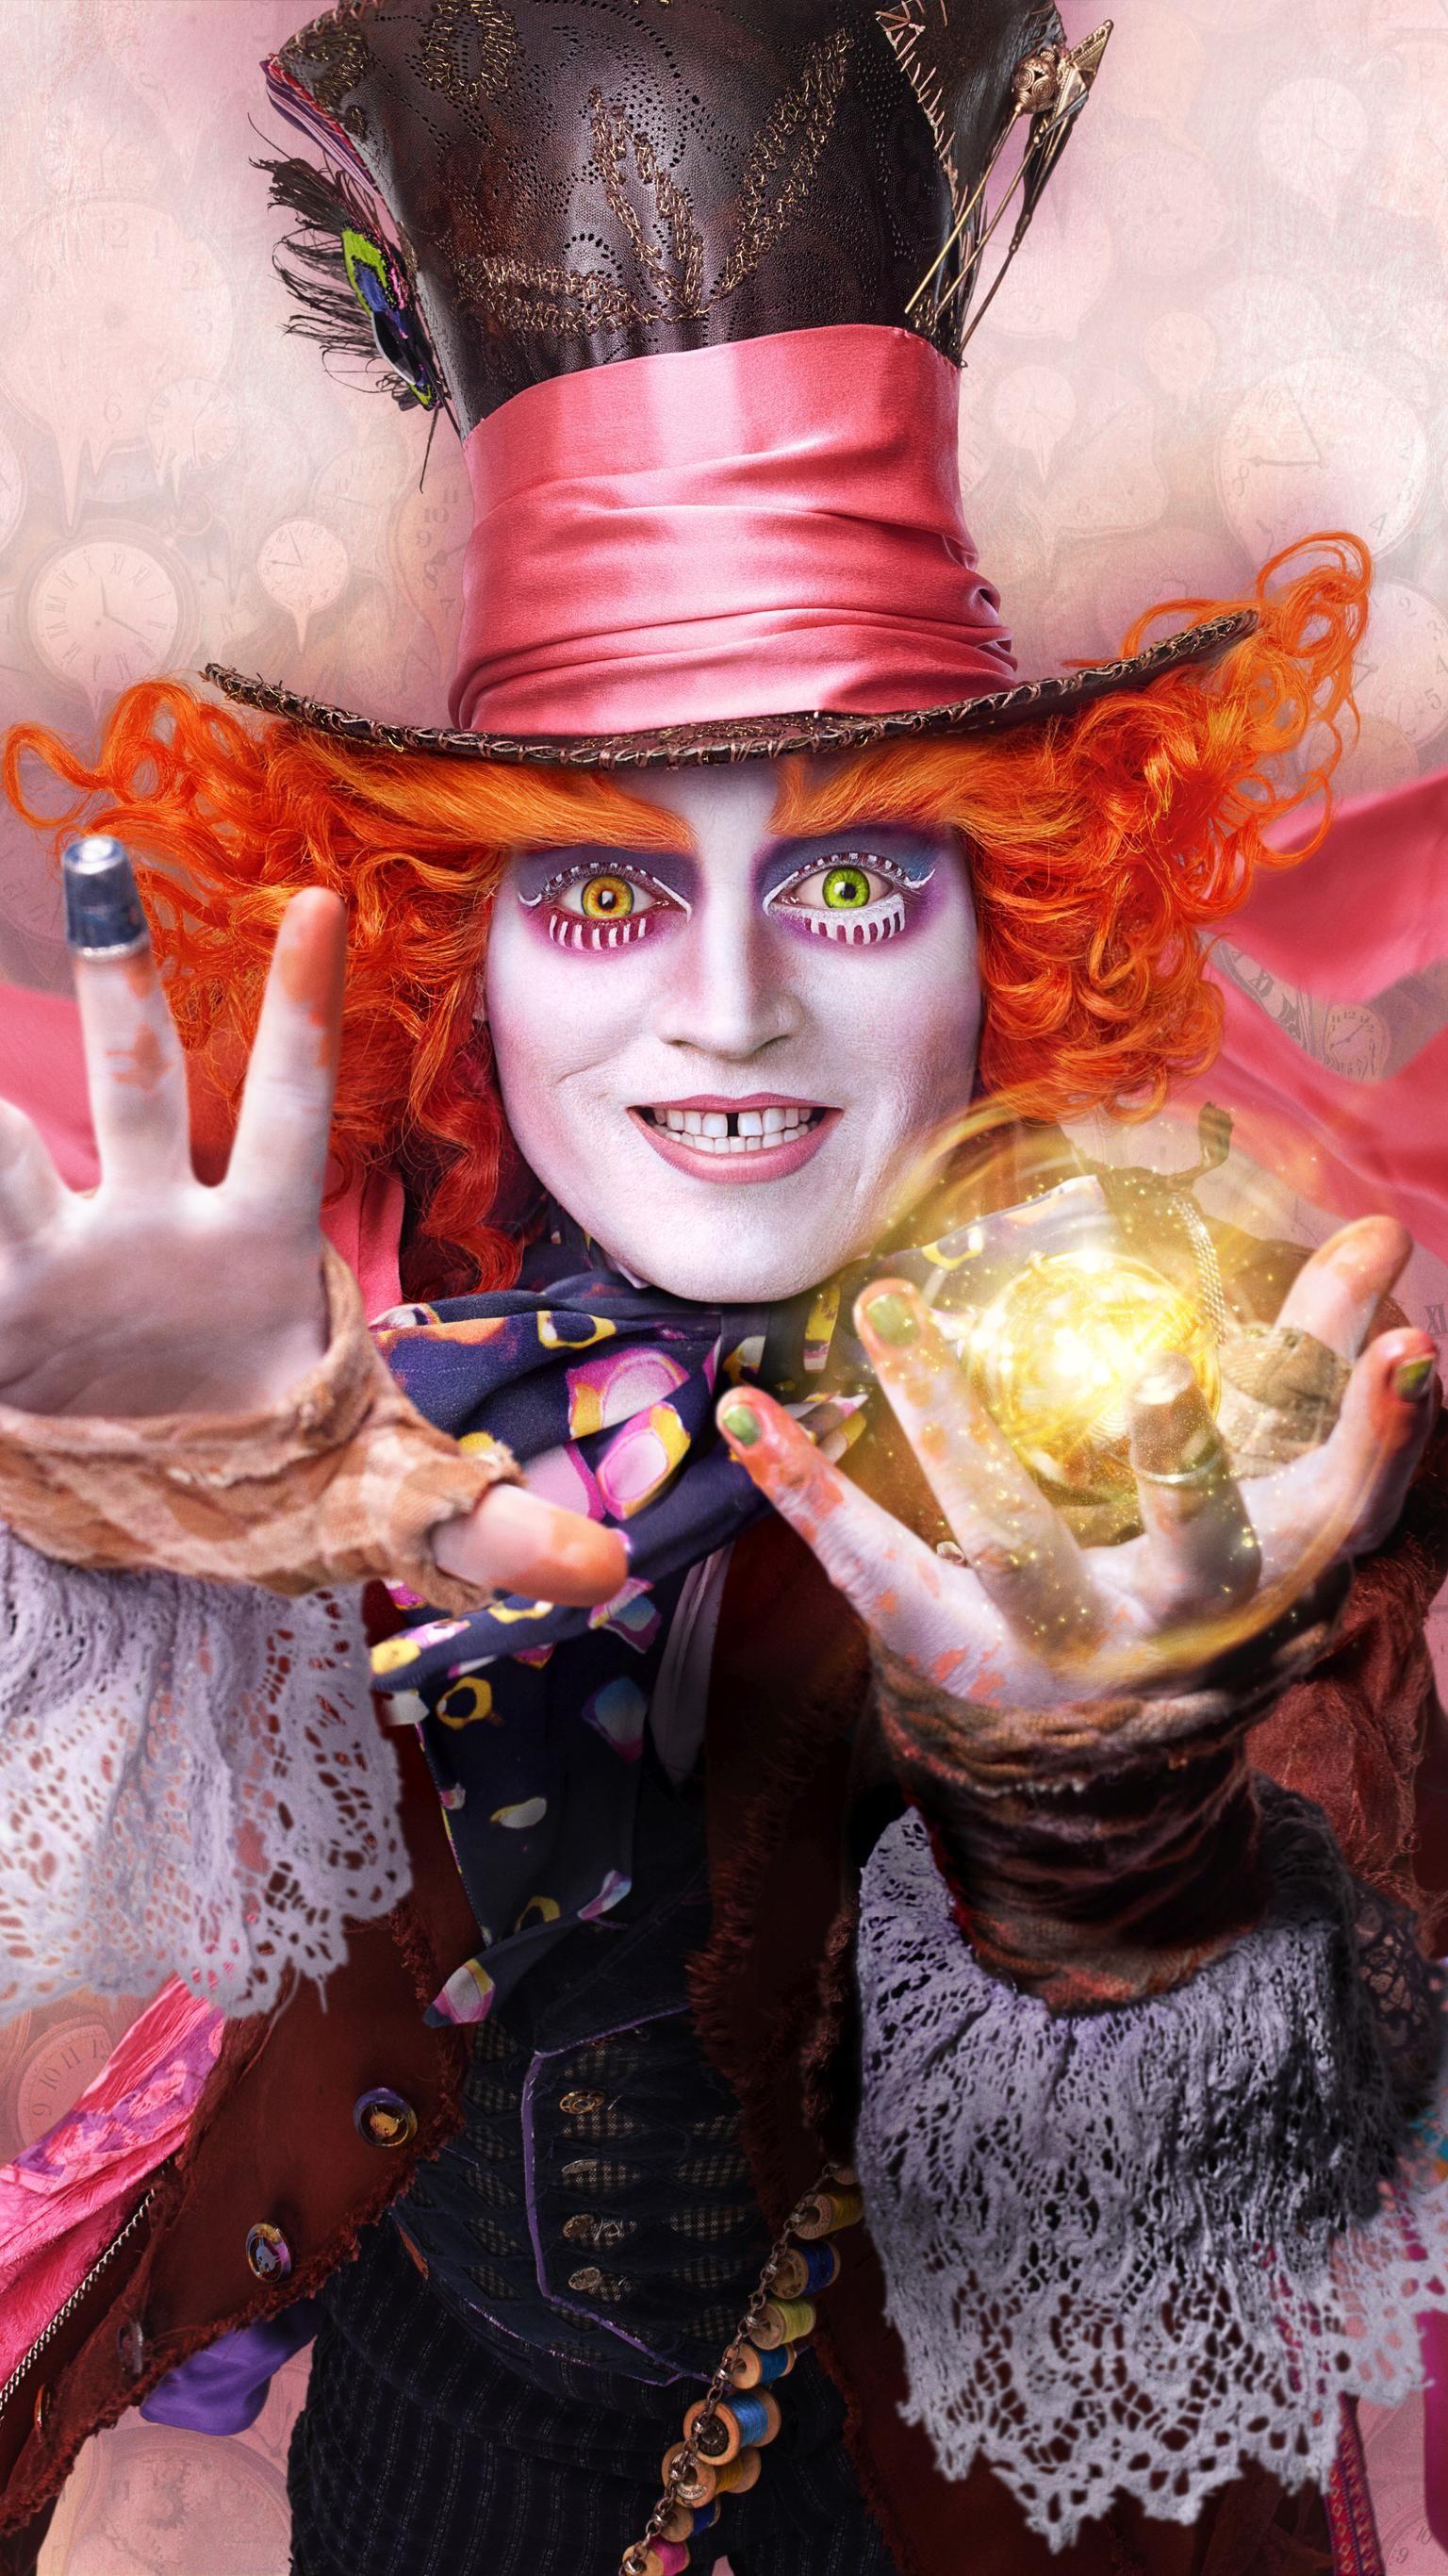 Alice Through The Looking Glass 2016 Phone Wallpaper Moviemania Alice In Wonderland Disney Film Alice In Wonderland Mad Hatter Disney